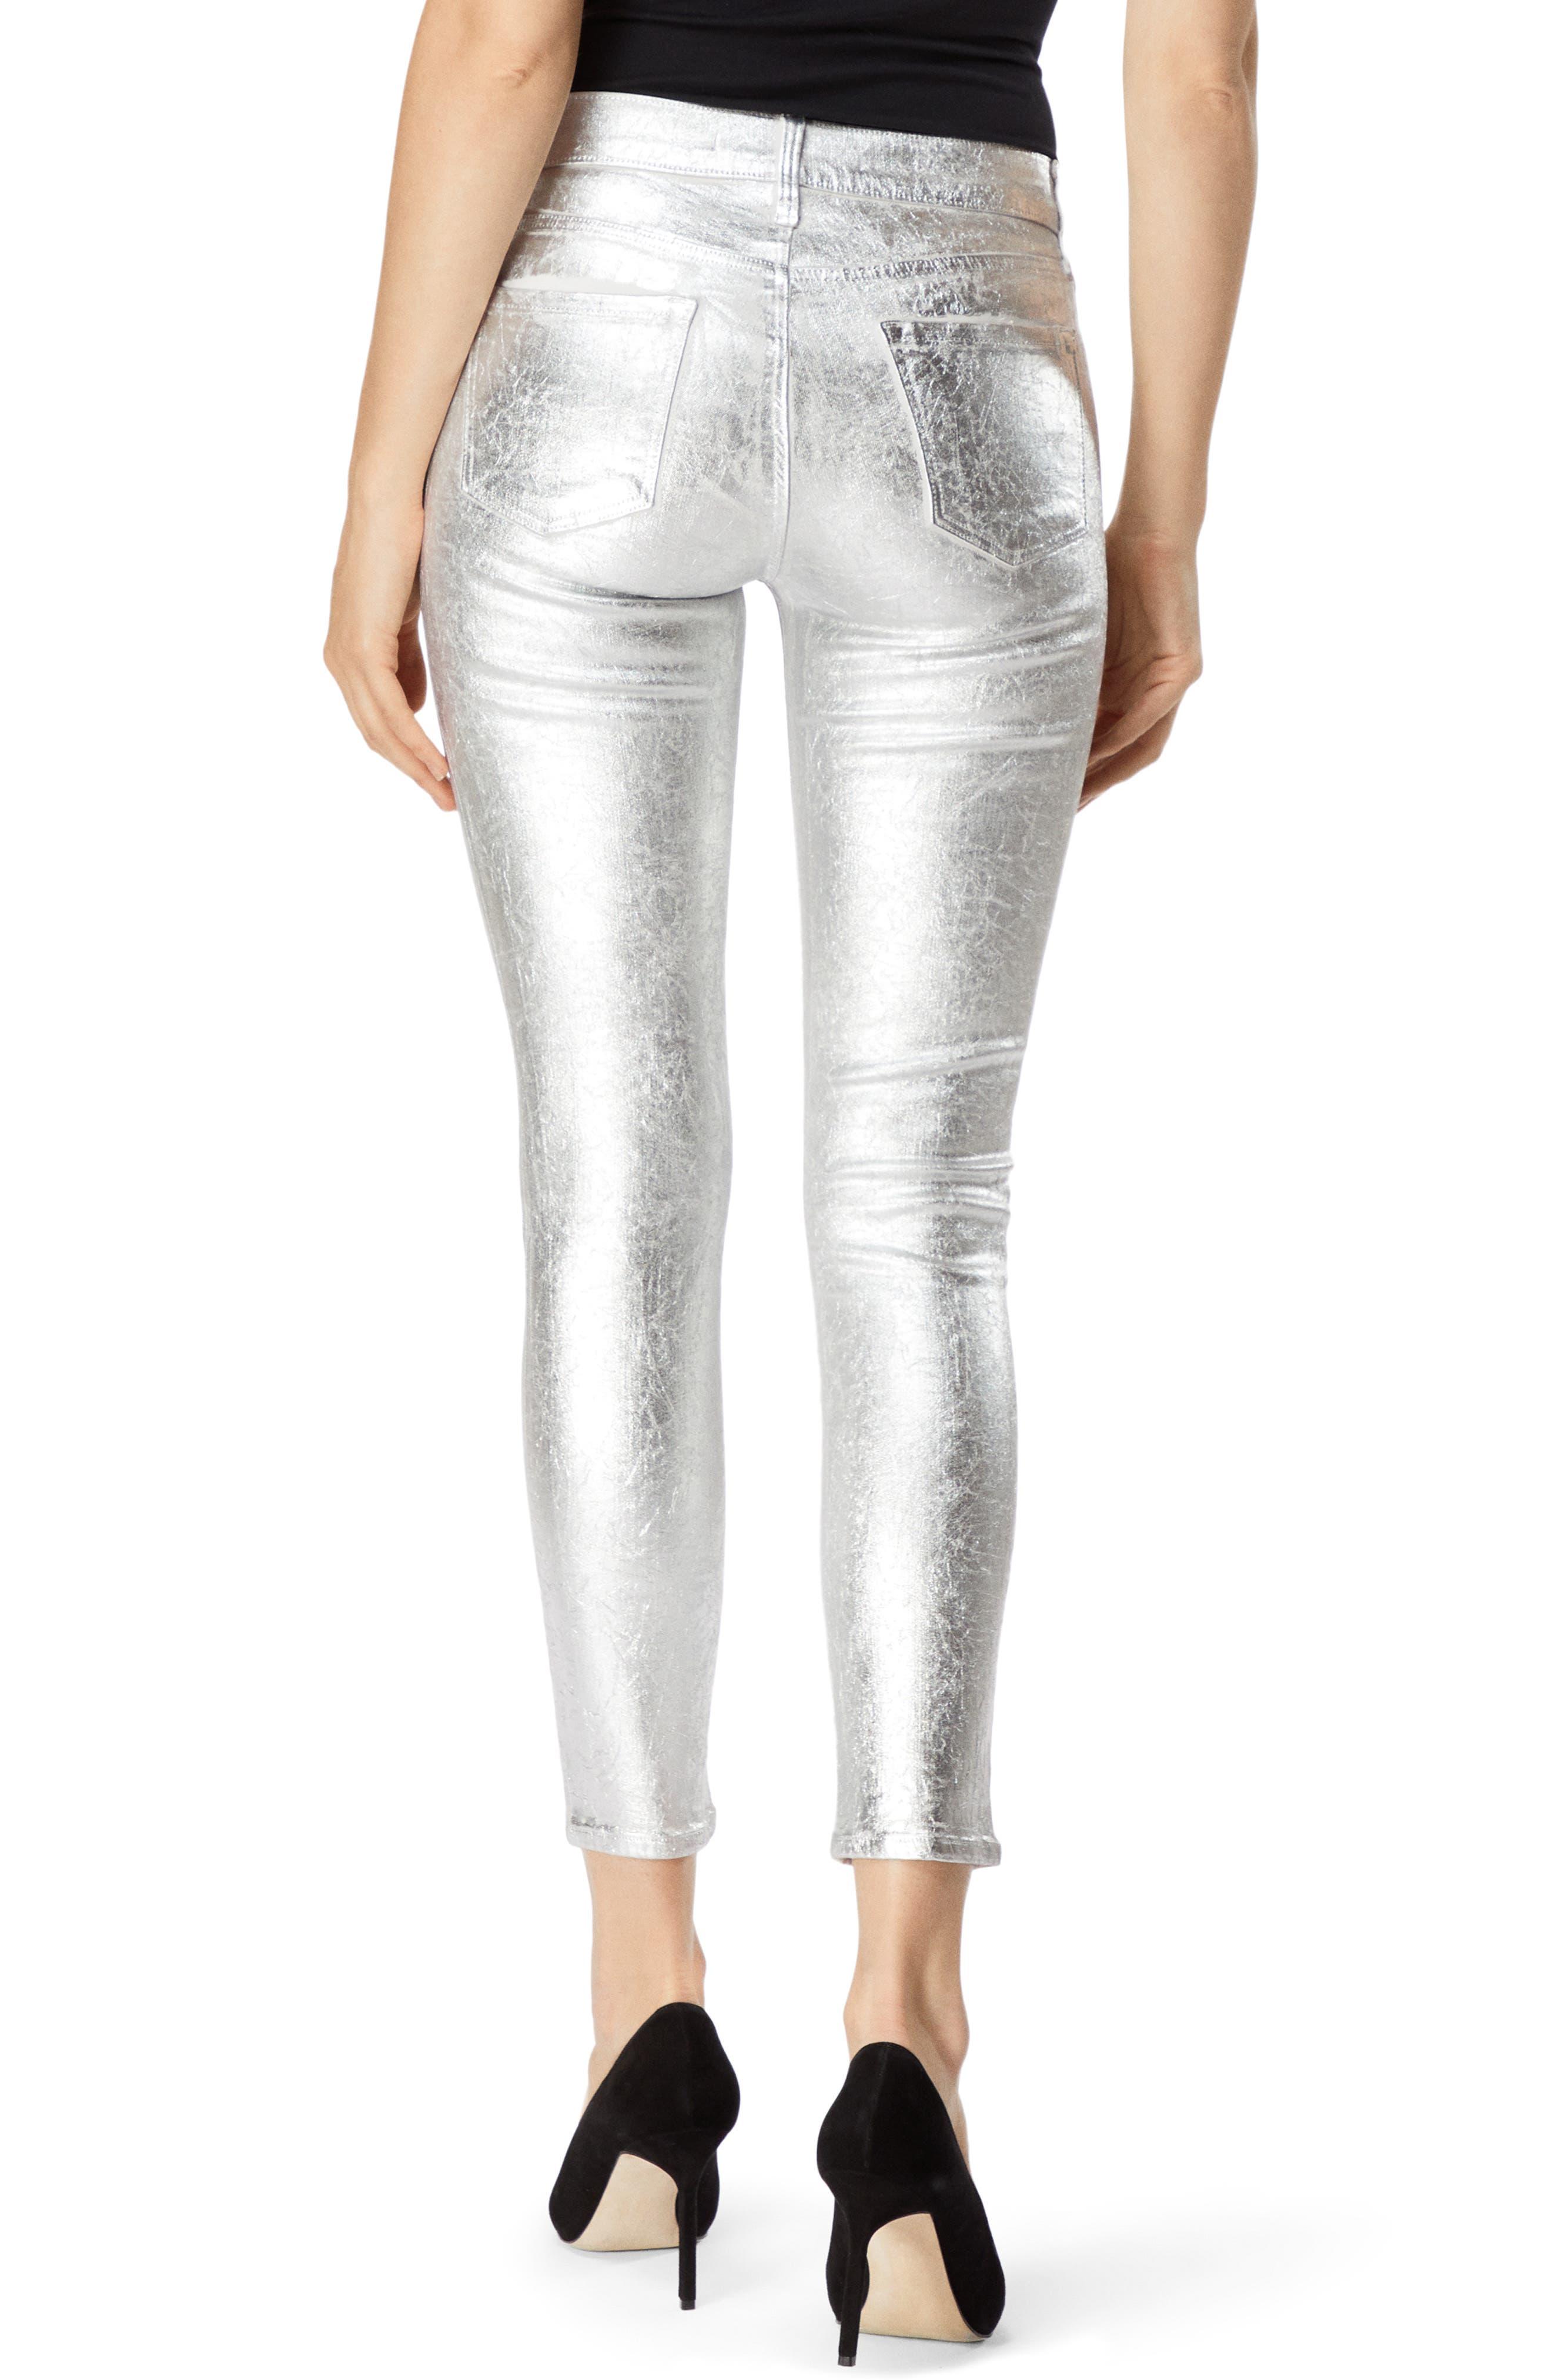 835 Capri Skinny Jeans,                             Alternate thumbnail 2, color,                             SUPERMOON CRISTALLINE